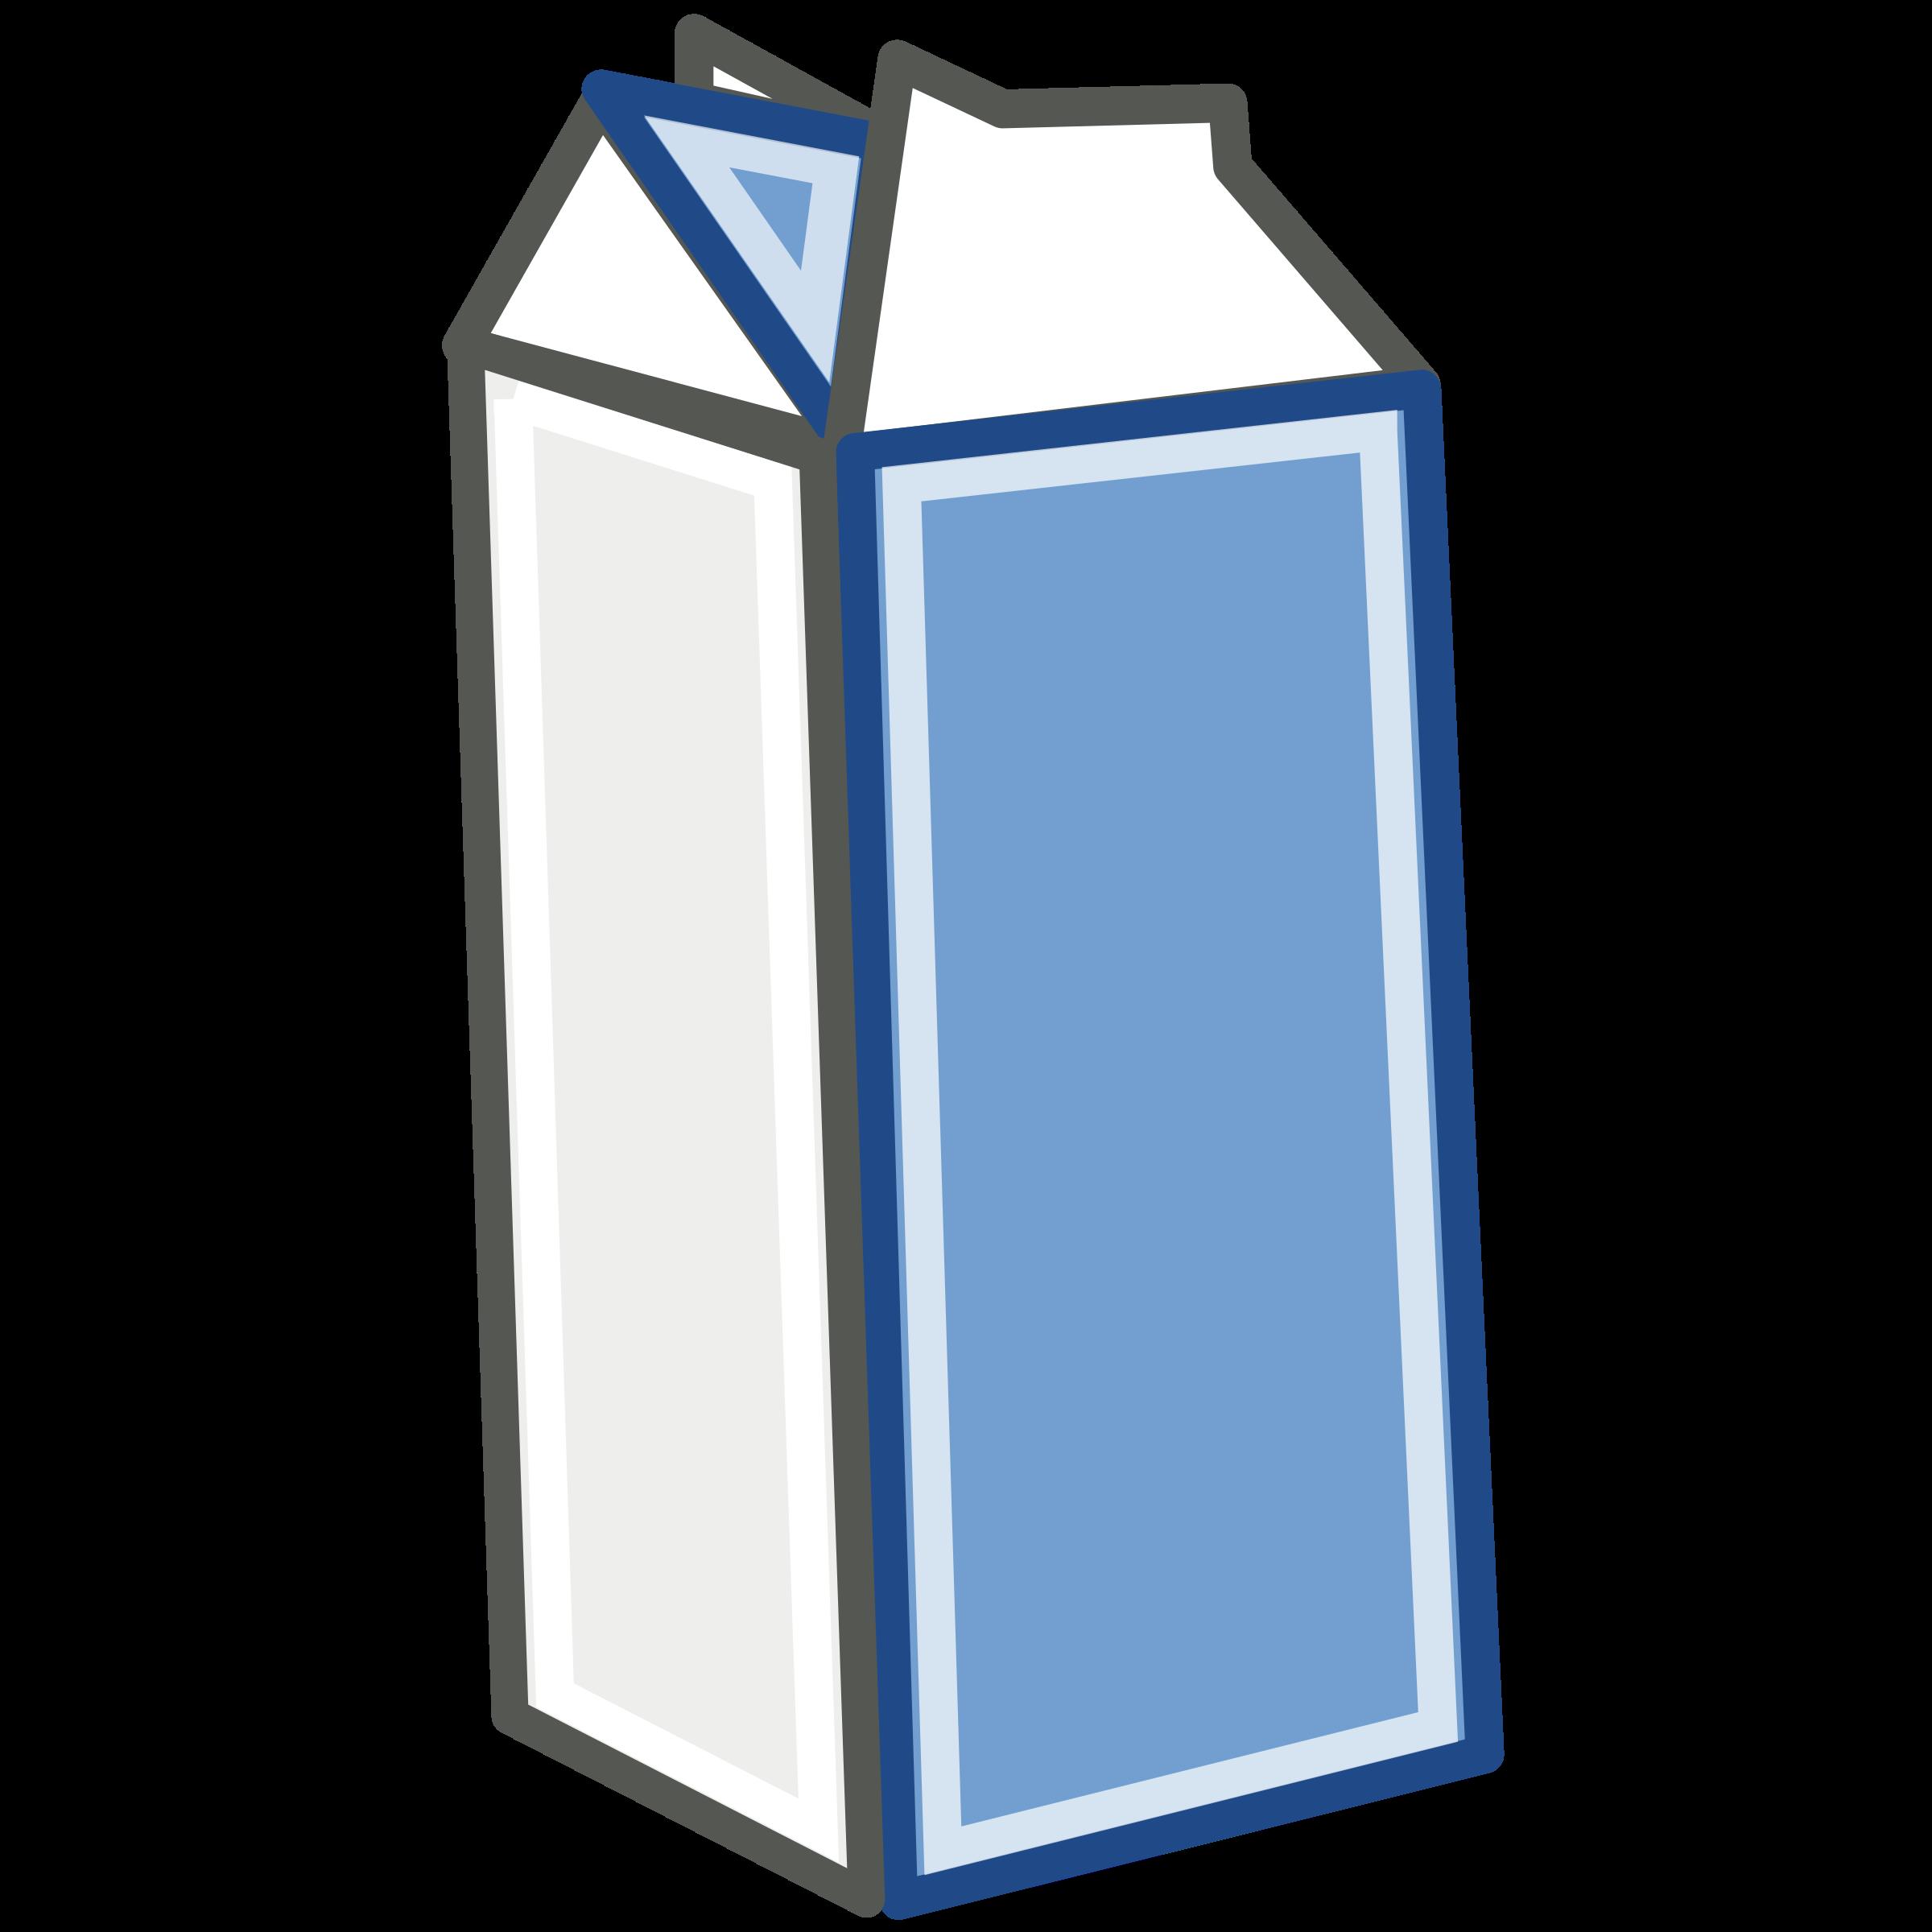 drinks clipart milk carton